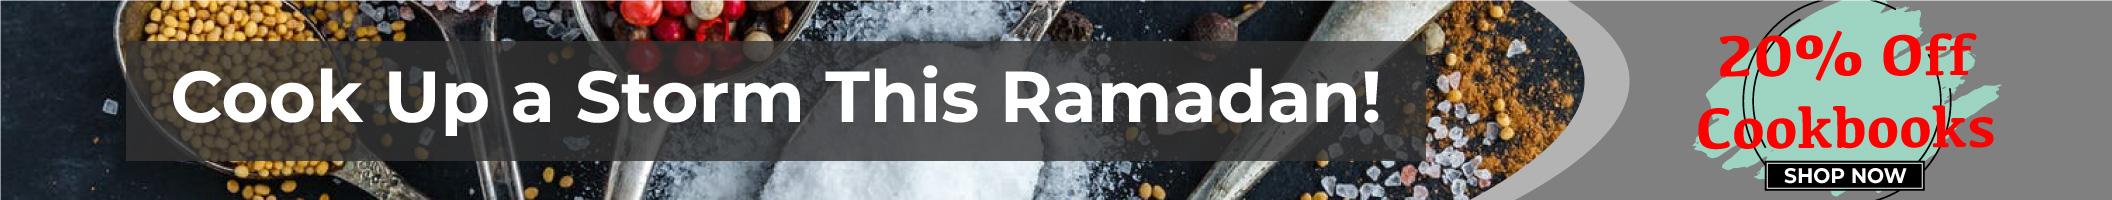 Ramadan Cookbook offer homepage banner 2112x200